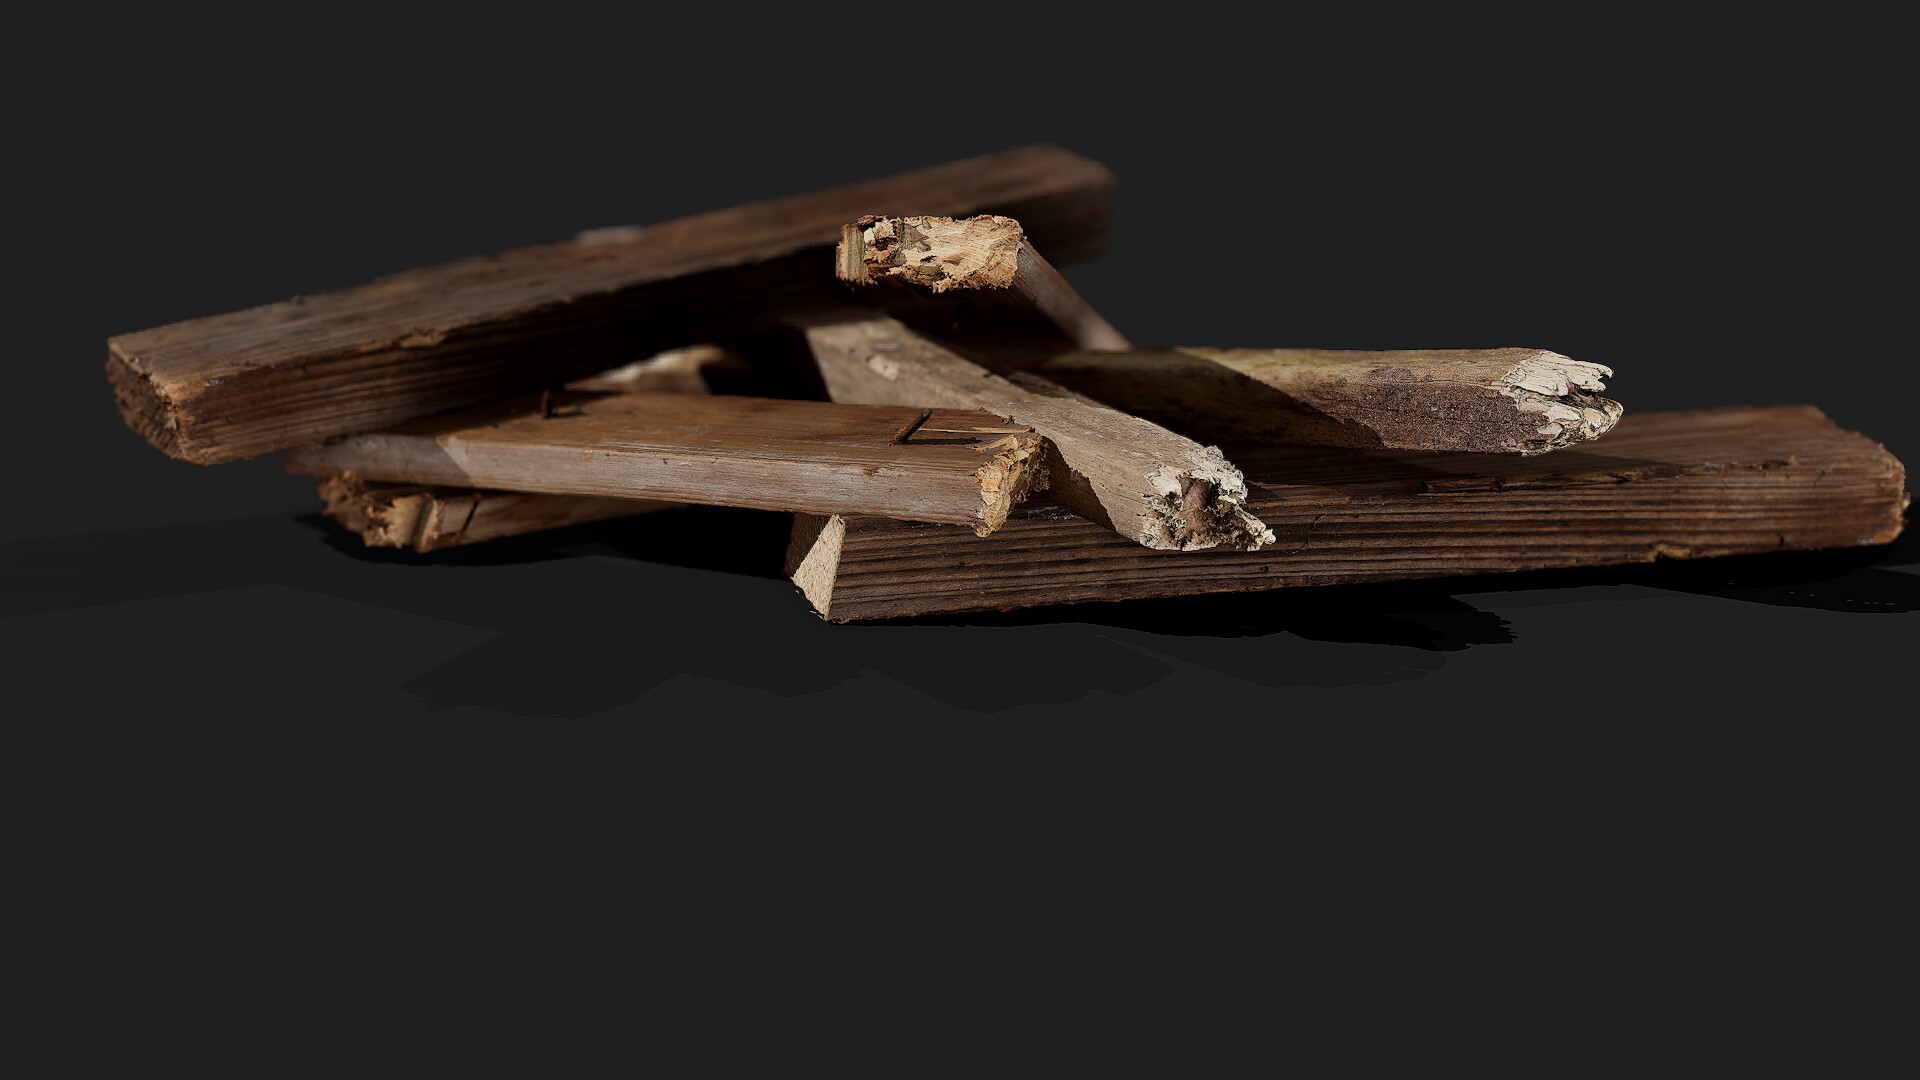 Wood Debri